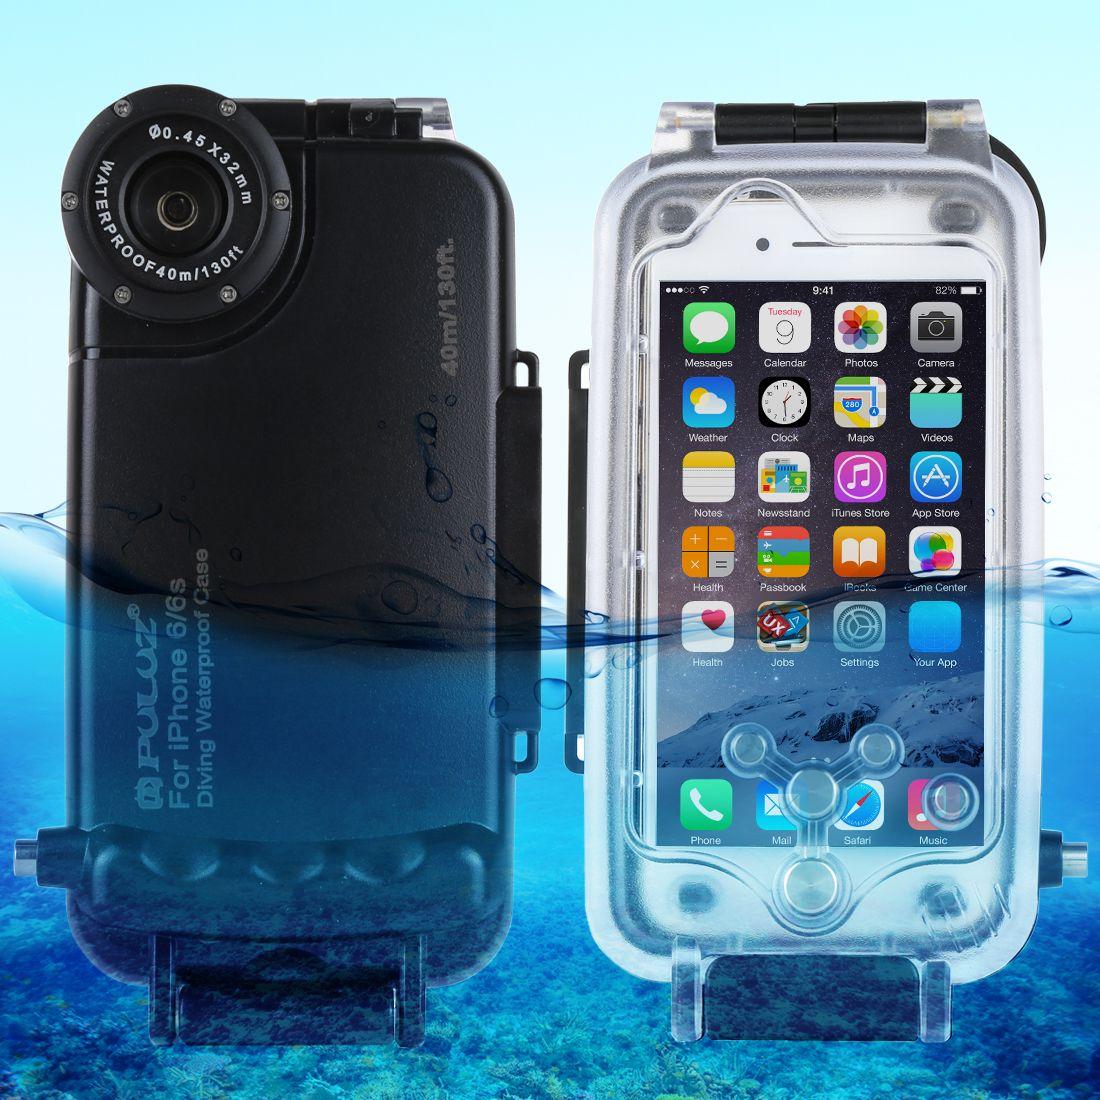 Tag: custodia iphone 6 plus cellularline